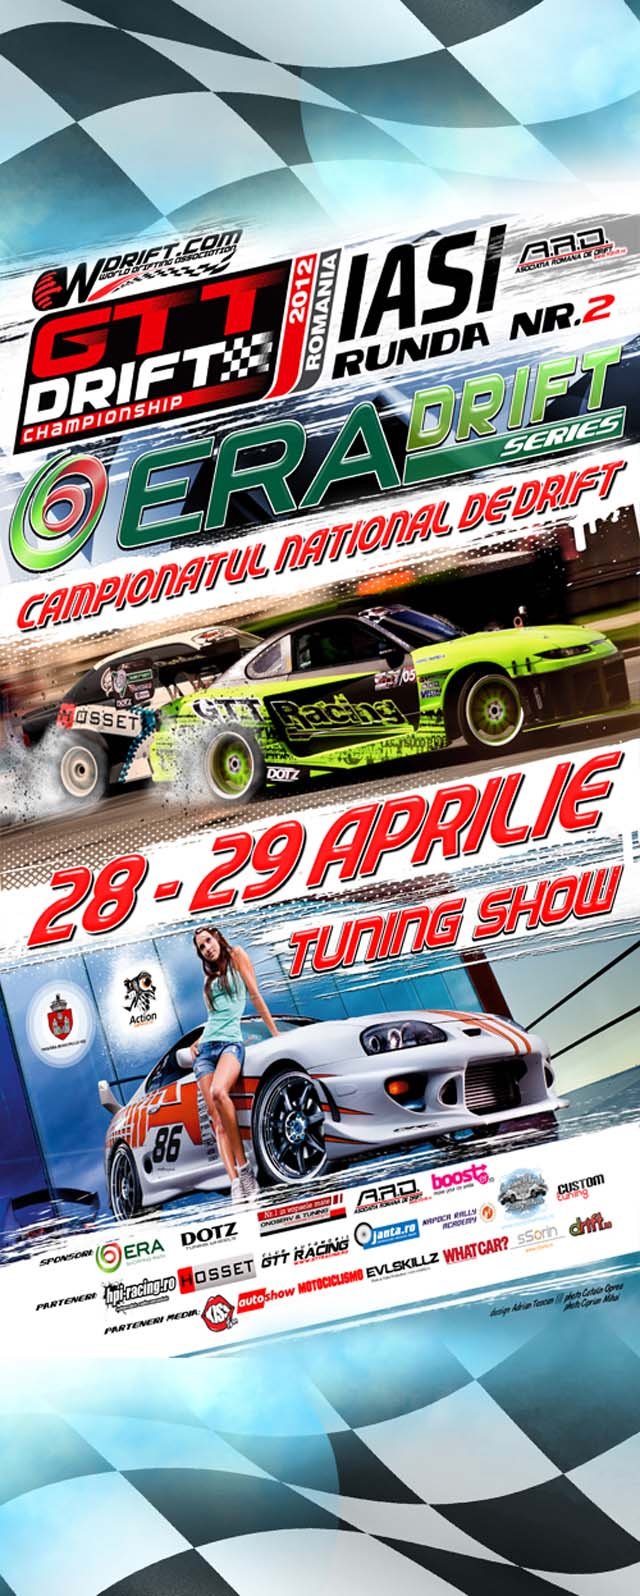 Campionatului National de Drift – GTT Drift Championship, 28 , 29 aprilie la ERA Park